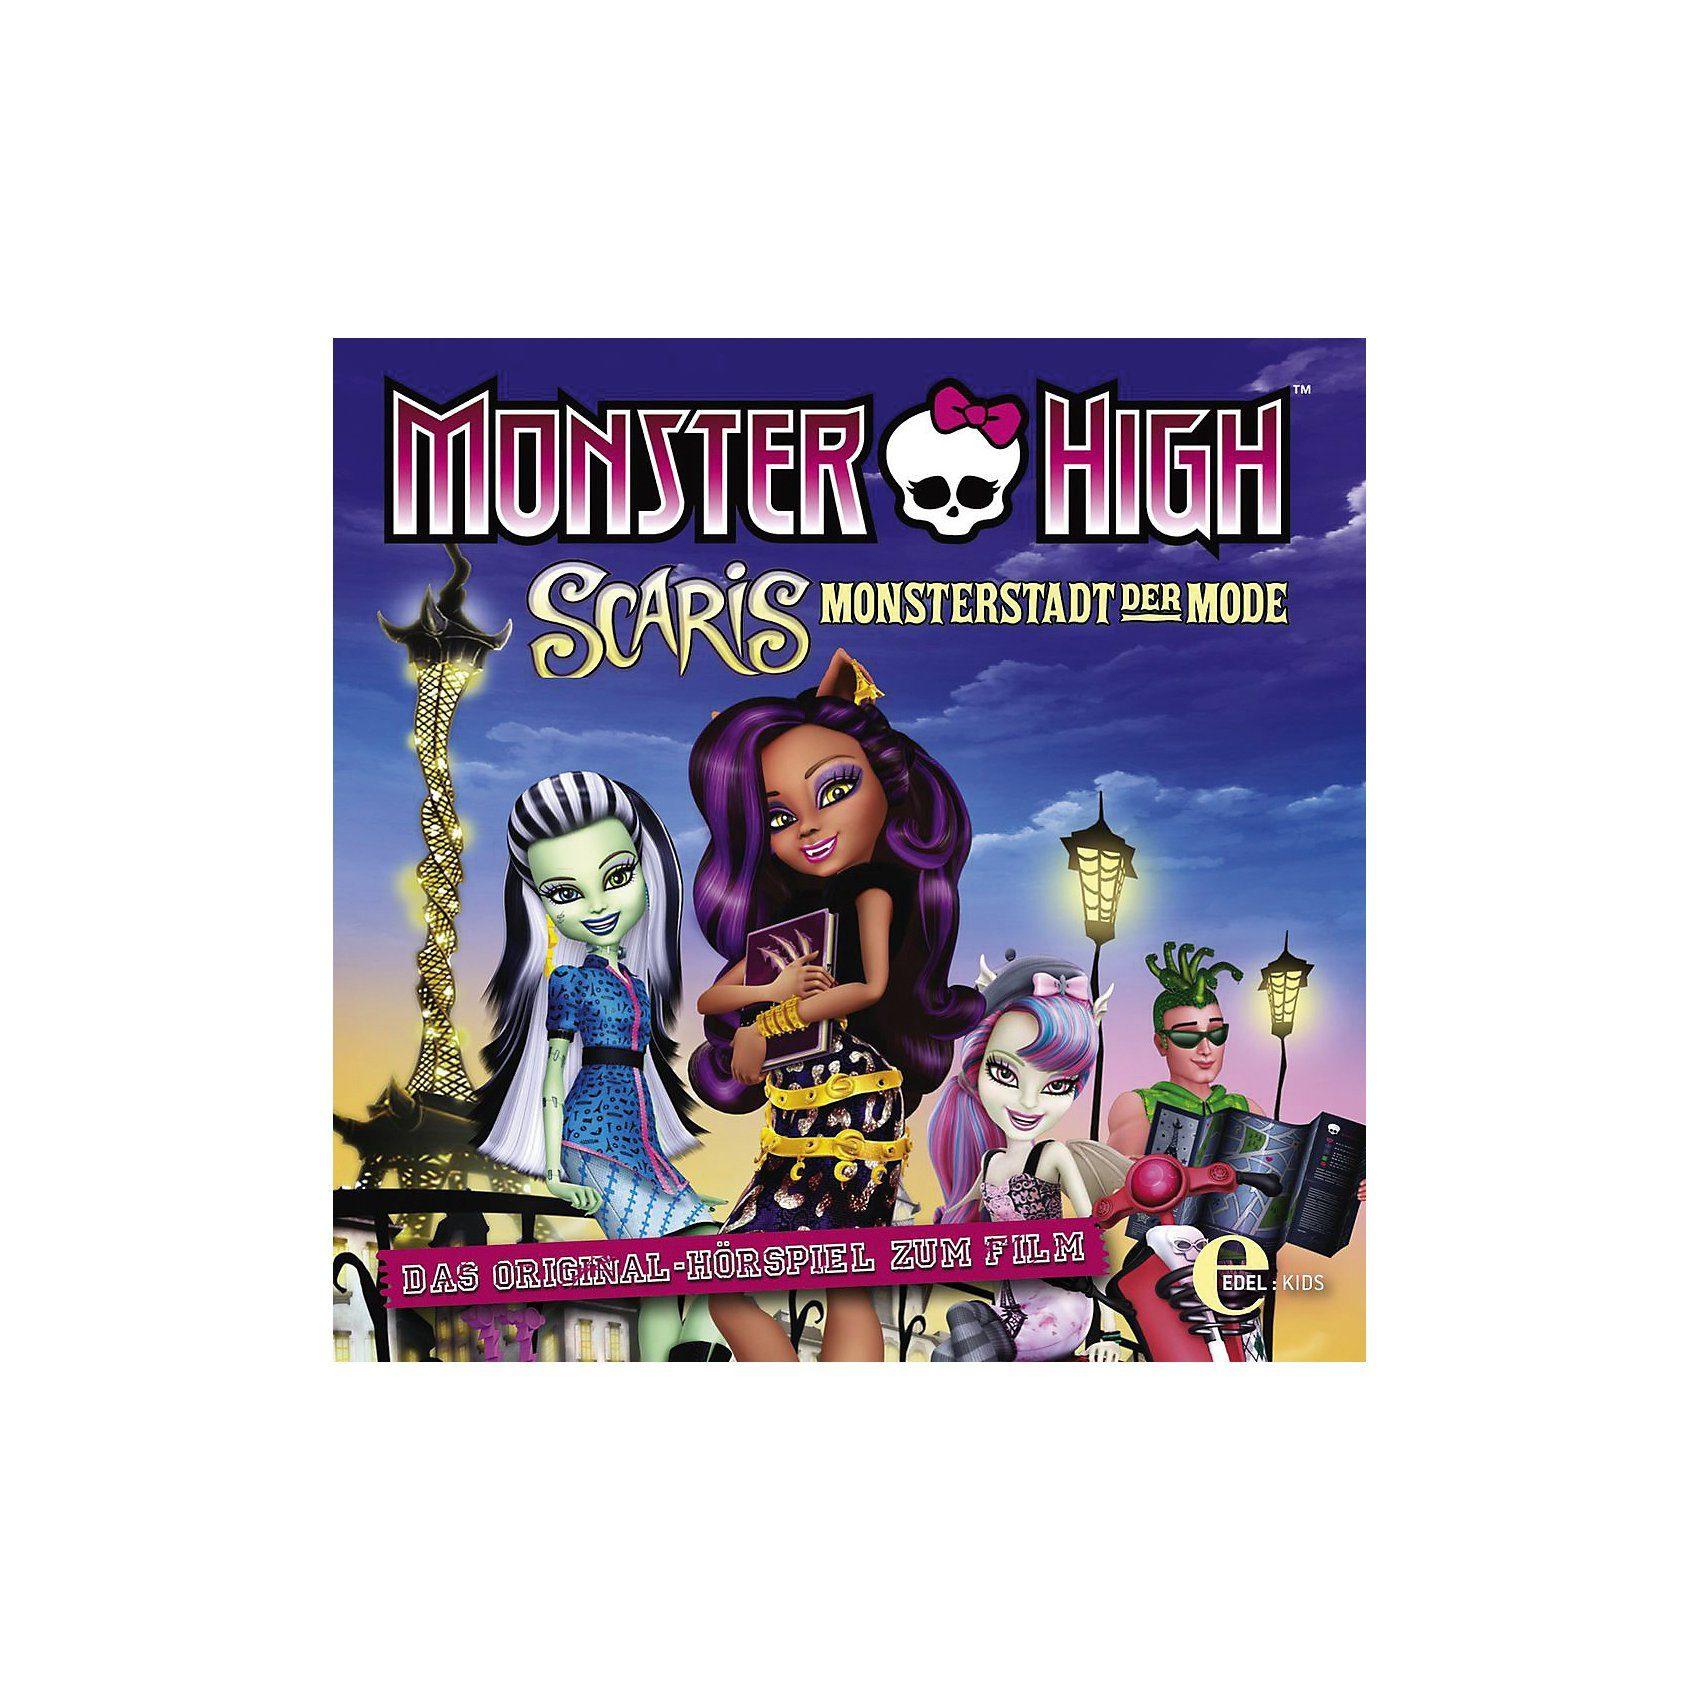 Edel CD Monster High - Scaris: Monsterstadt der Mode (Hörspiel zu